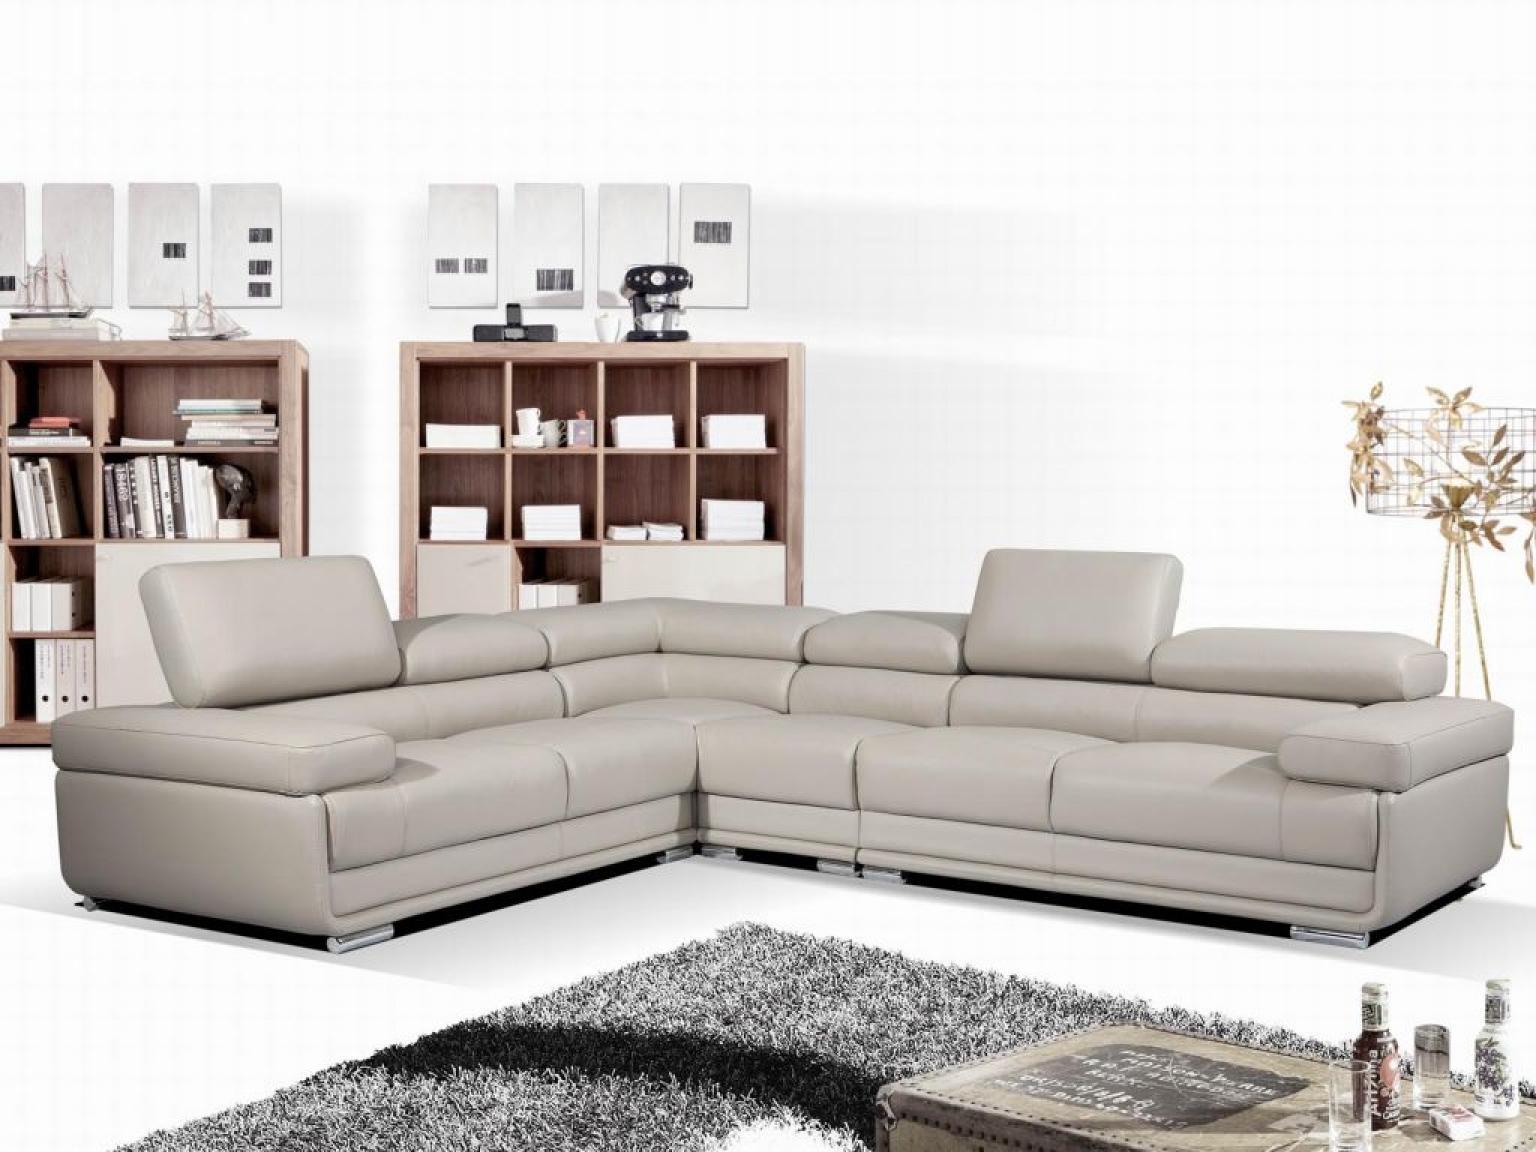 photos canap angle cuir gris. Black Bedroom Furniture Sets. Home Design Ideas